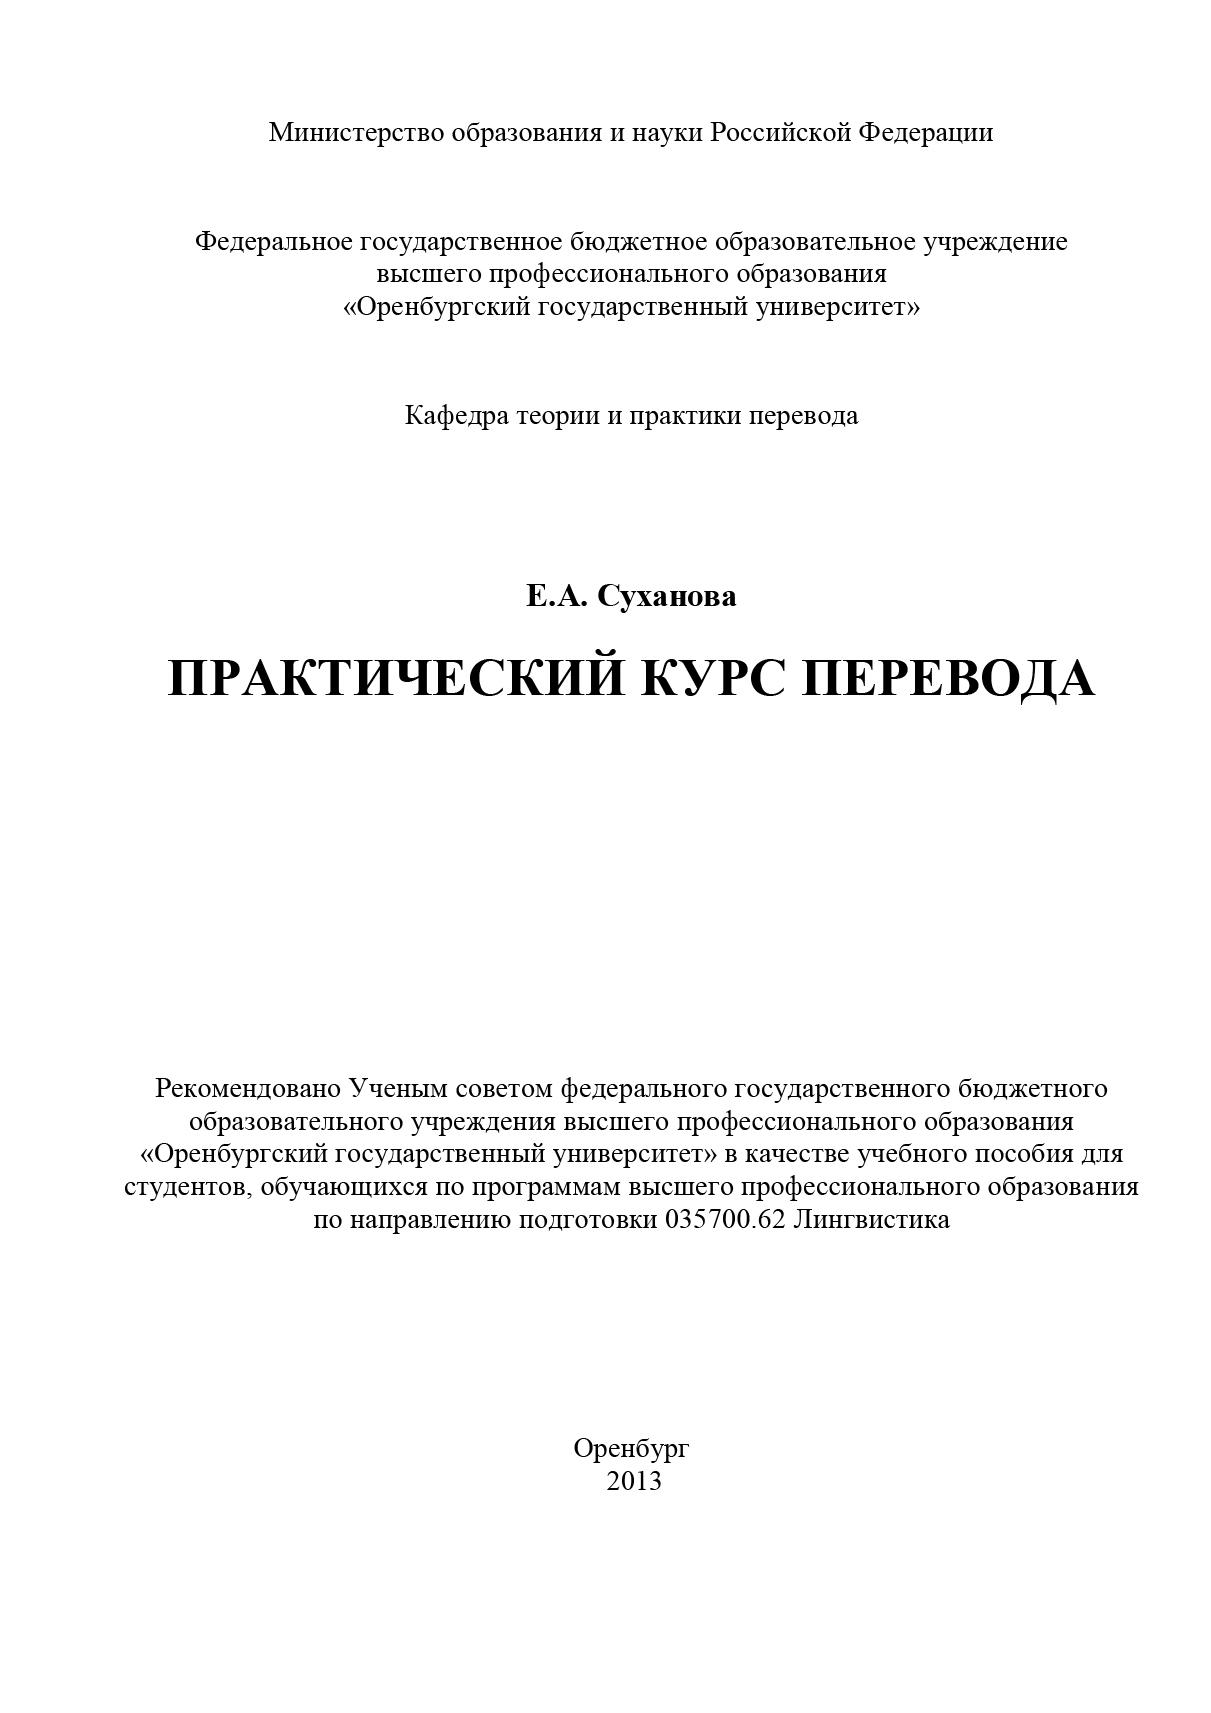 Е. А. Суханова Практический курс перевода